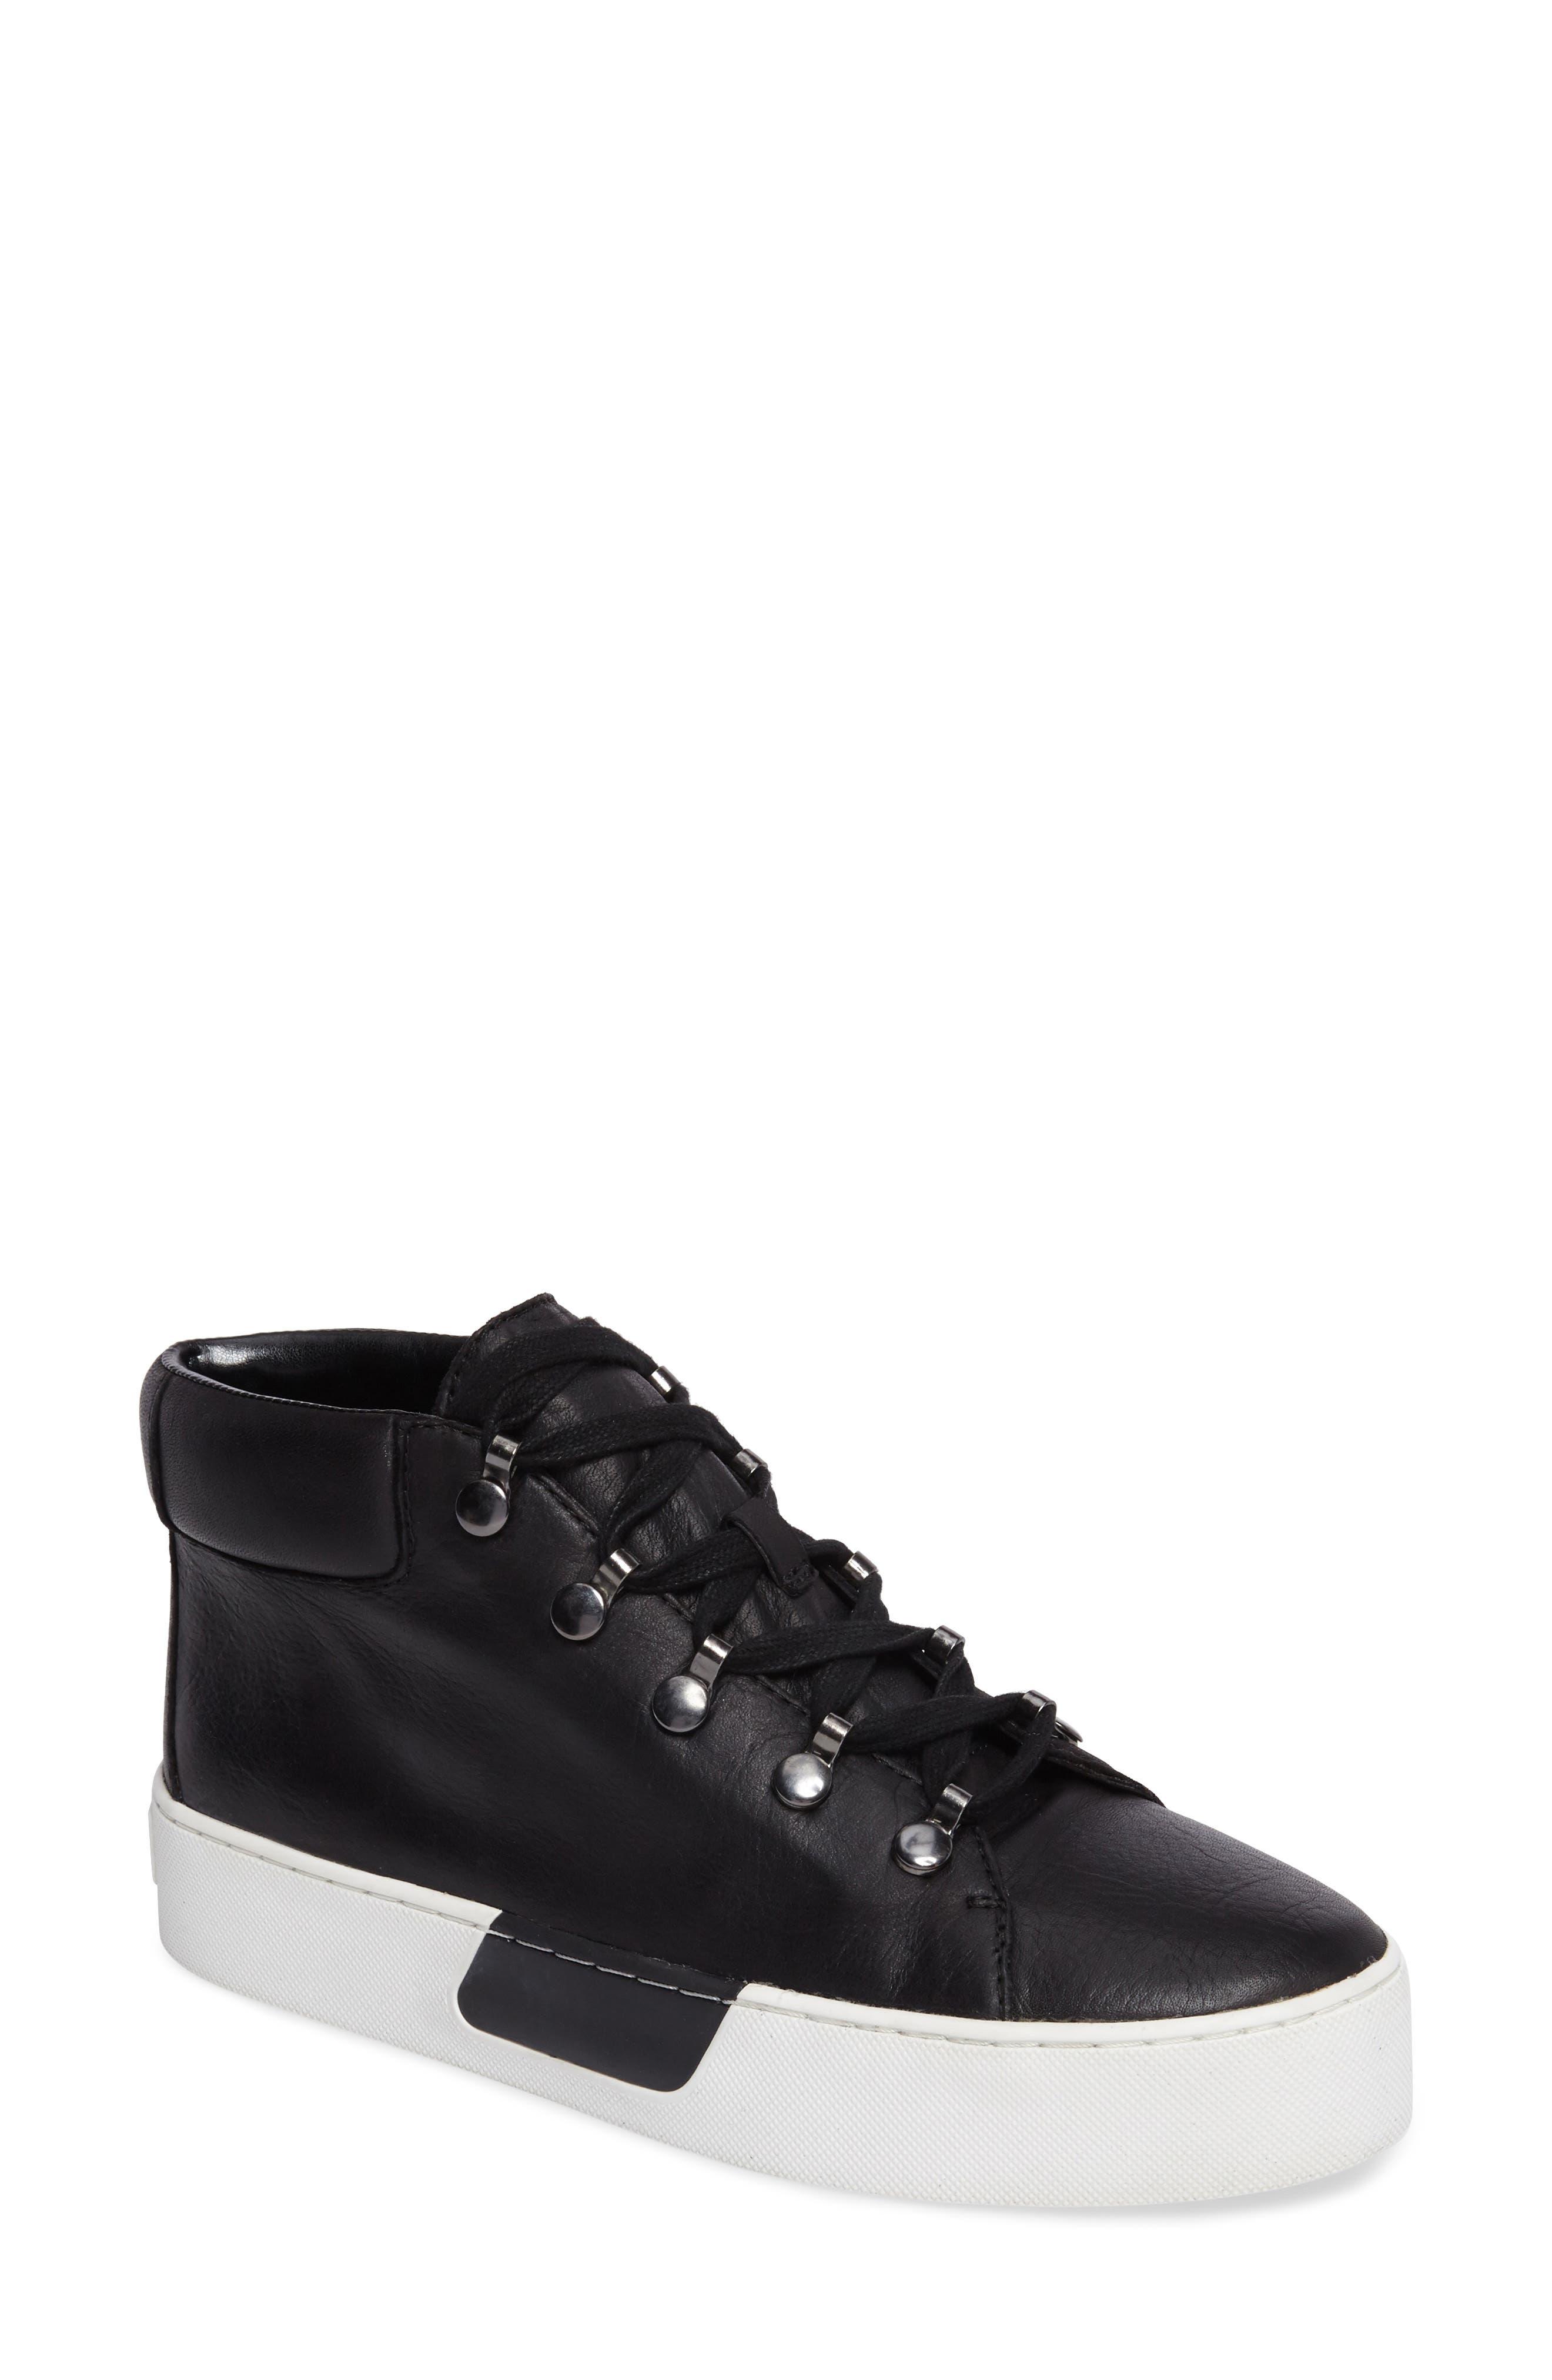 Wrine High Top Sneaker,                             Main thumbnail 1, color,                             001